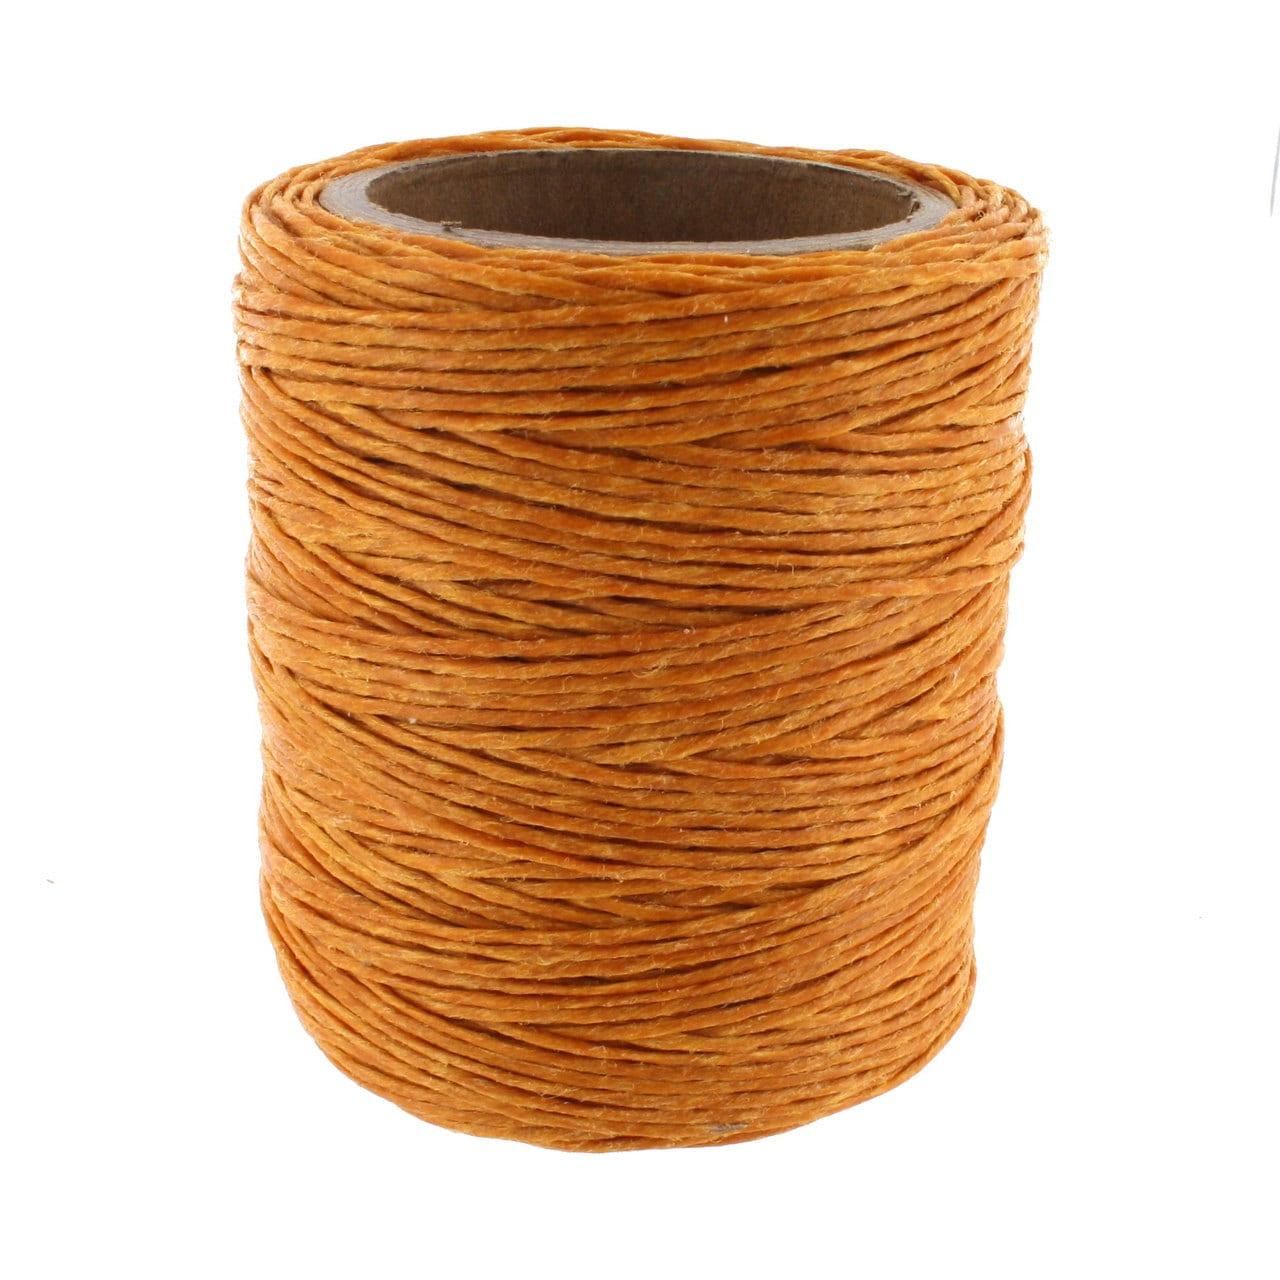 Maine Thread Waxed Cord 70 Yard Spool Topaz Gold .045